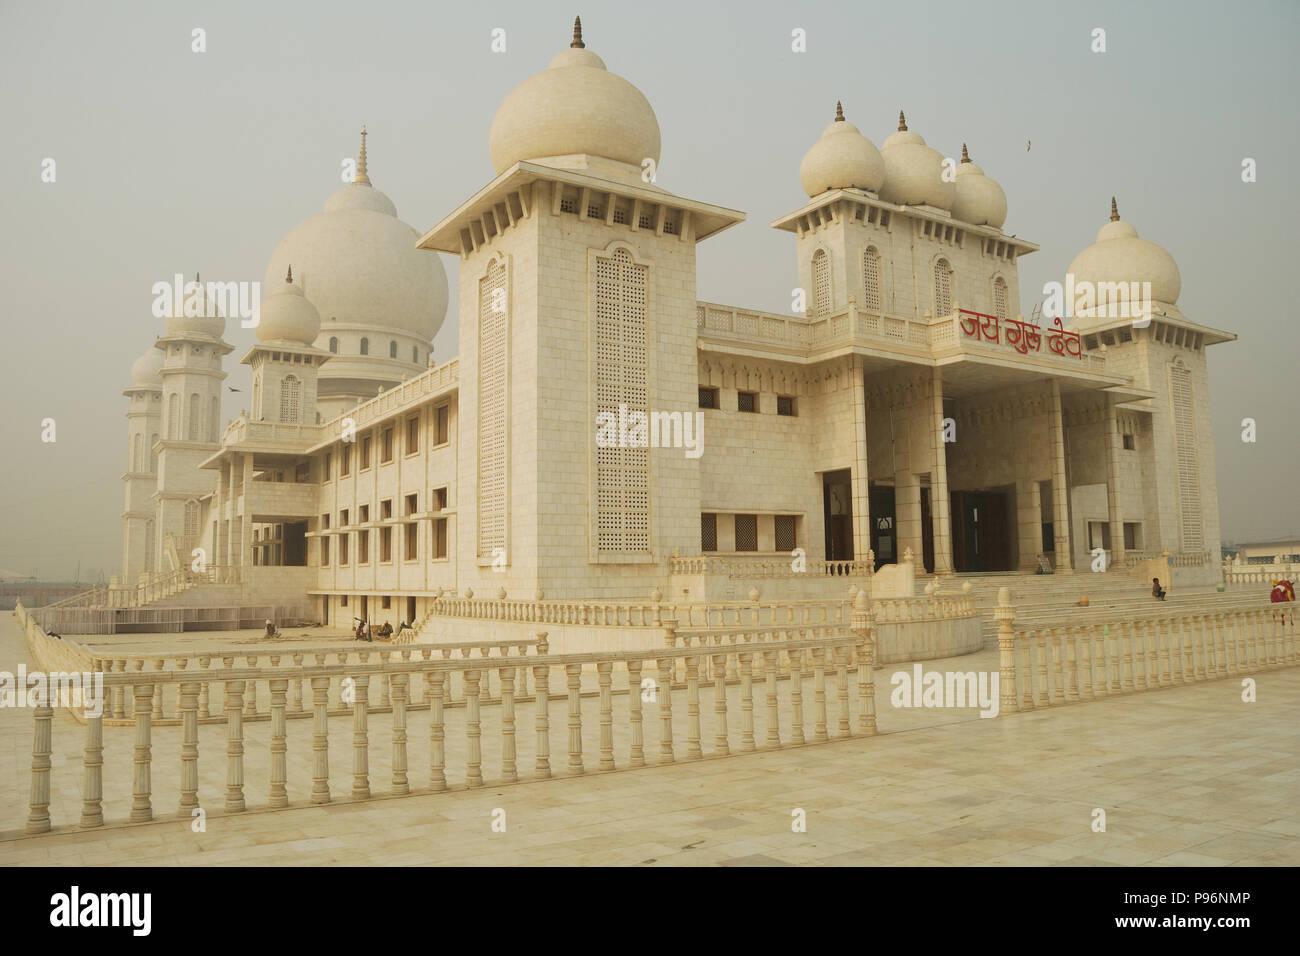 Jai Gurudev Mandir, Mathura, Uttar Pradesh, India - Stock Image